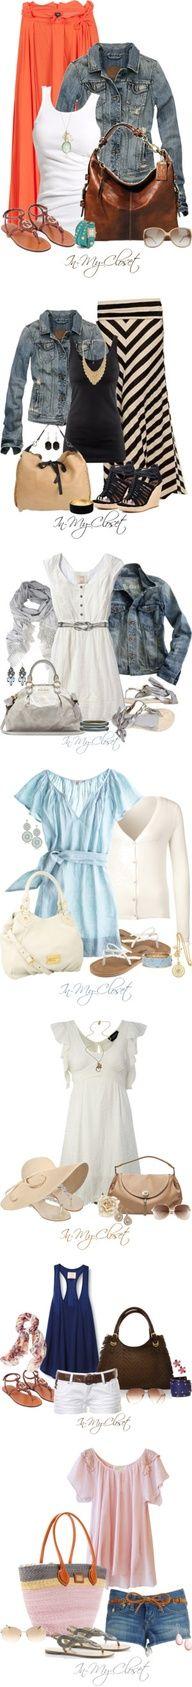 Polyvore Swag Outfits | Skinny Mom Fashion